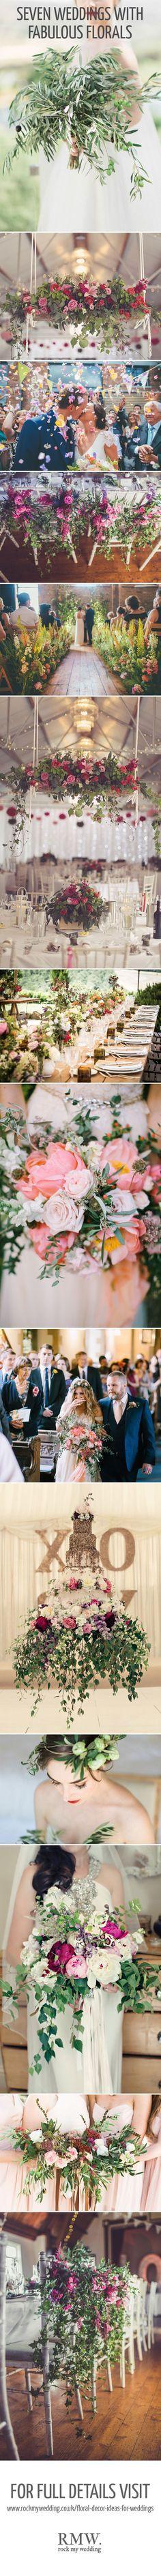 Fabulous Floral Weddings | Wedding Flowers | Flower Inspiration | Wedding Flower Ideas | Bouquets | Centrepieces | http://www.rockmywedding.co.uk/floral-decor-ideas-for-weddings/